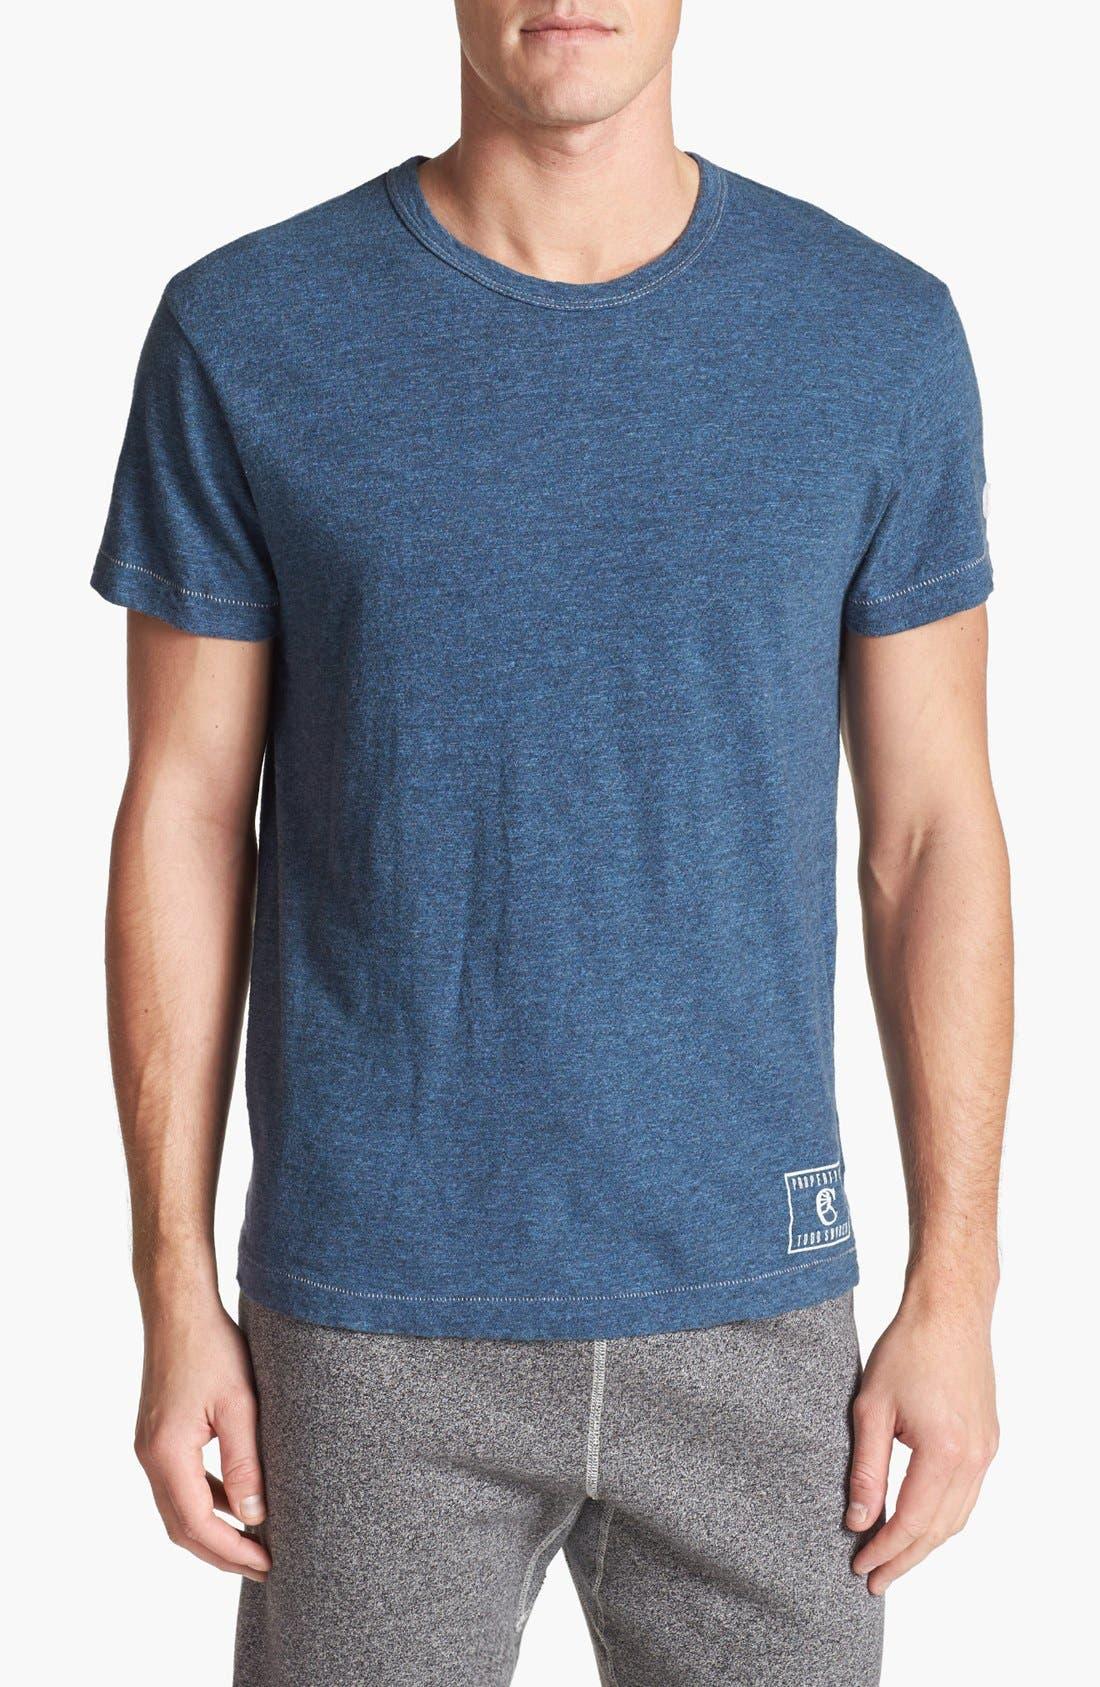 Main Image - Todd Snyder + Champion 'City Gym - Classic' Crewneck T-Shirt